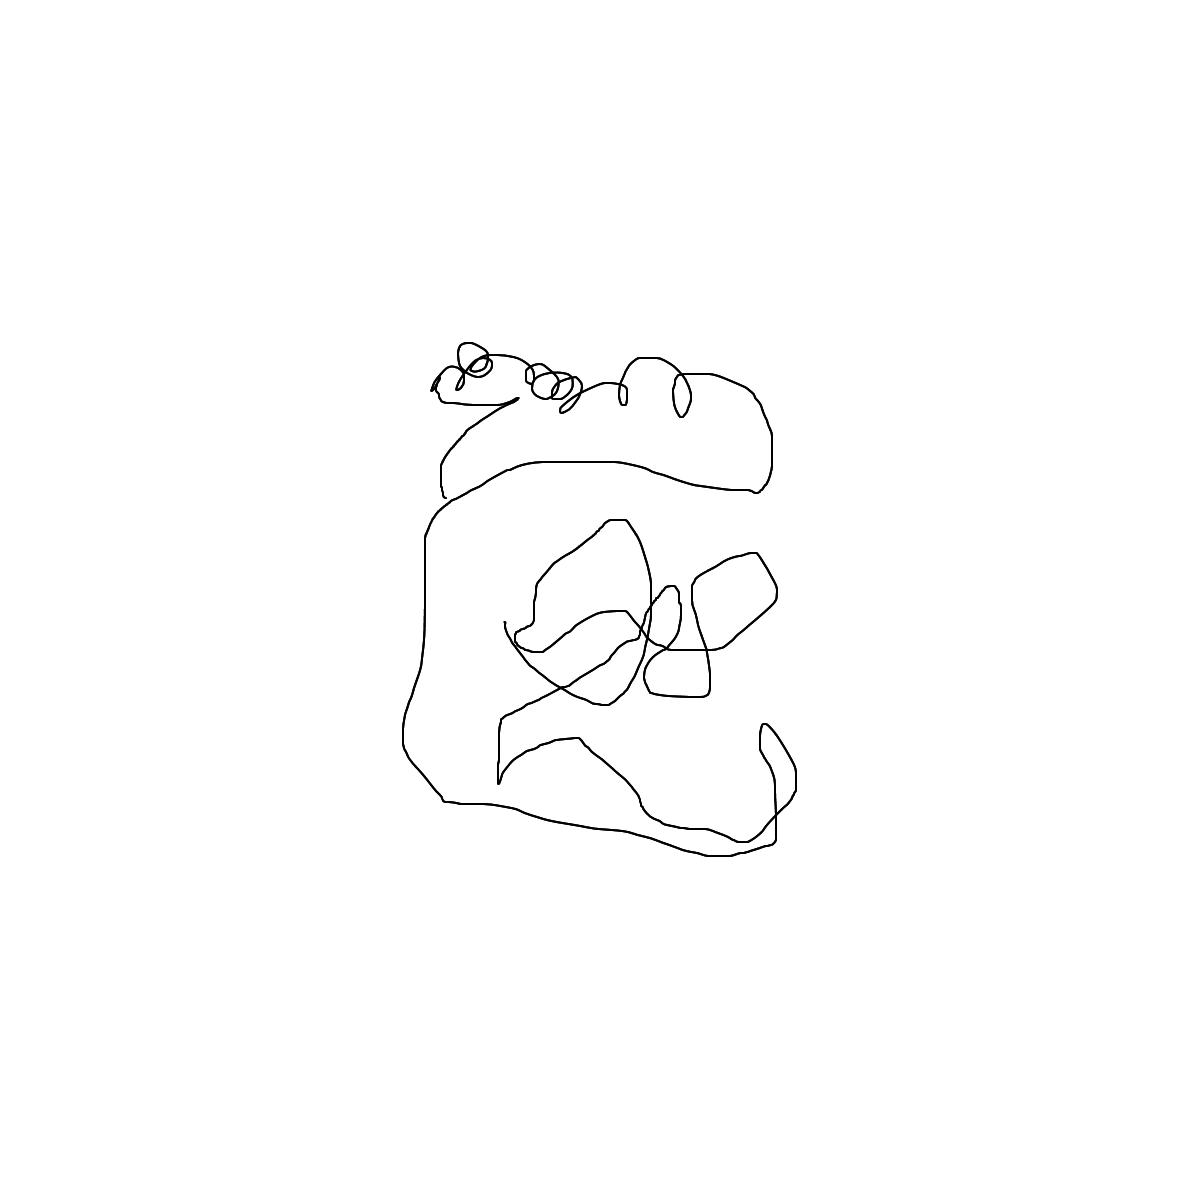 BAAAM drawing#3797 lat:46.2283020019531250lng: -63.1301879882812500